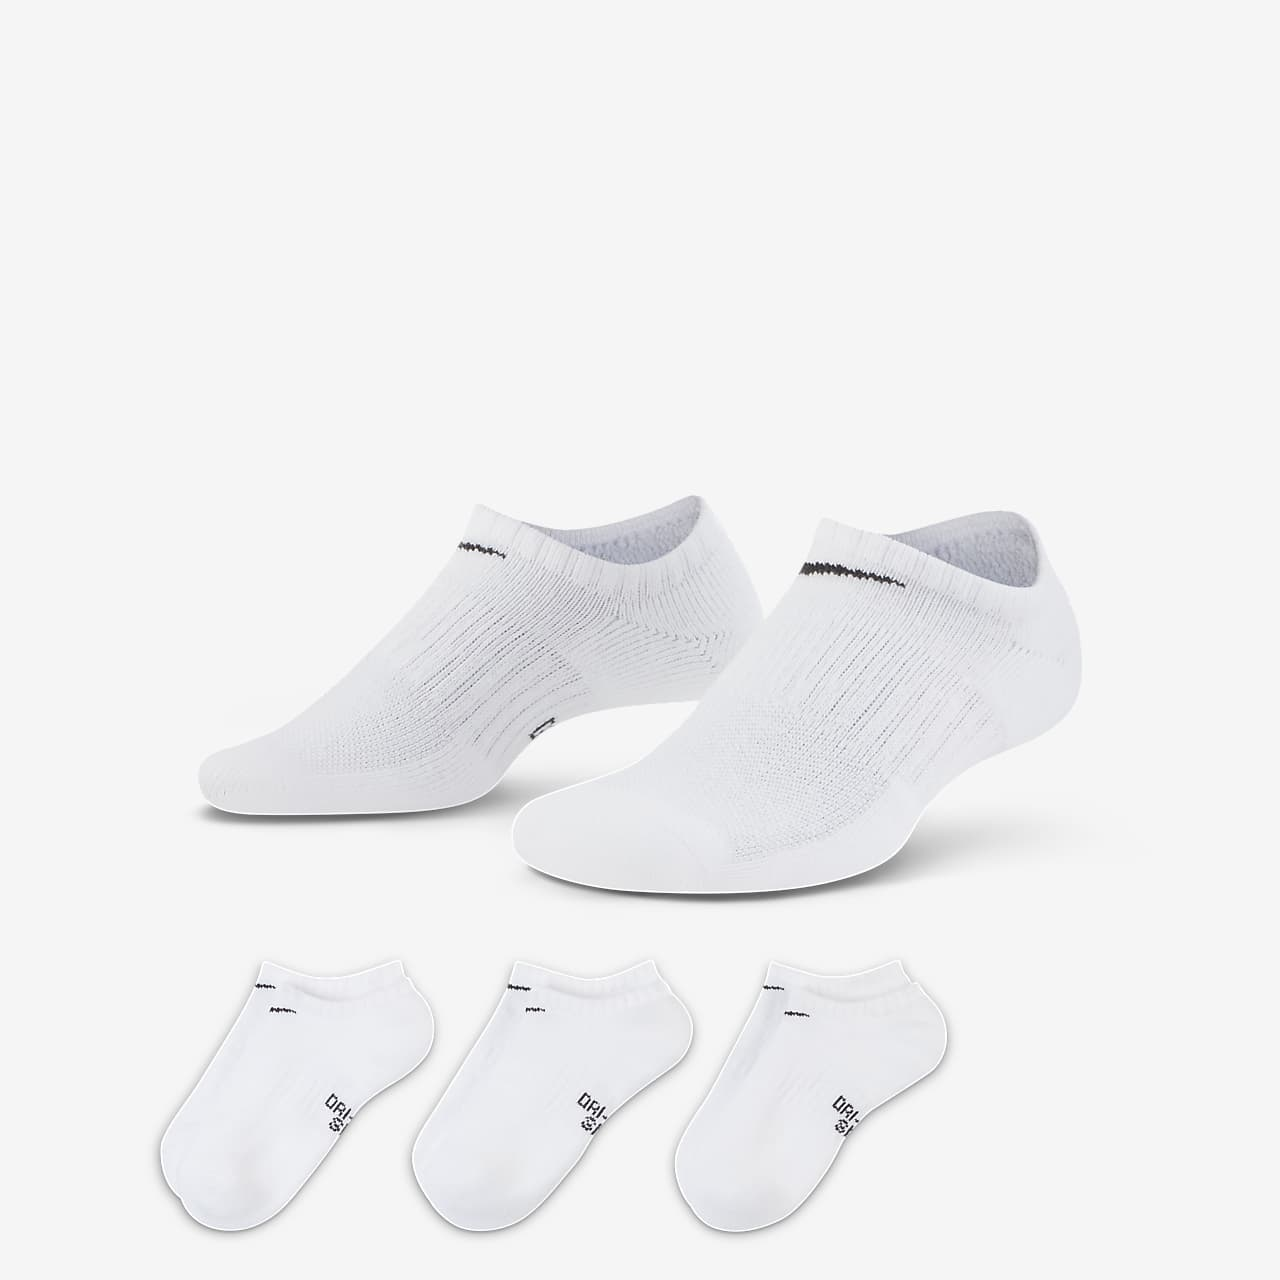 Nike Performance Cushioned No-Show Kids' Training Socks (3 Pairs)